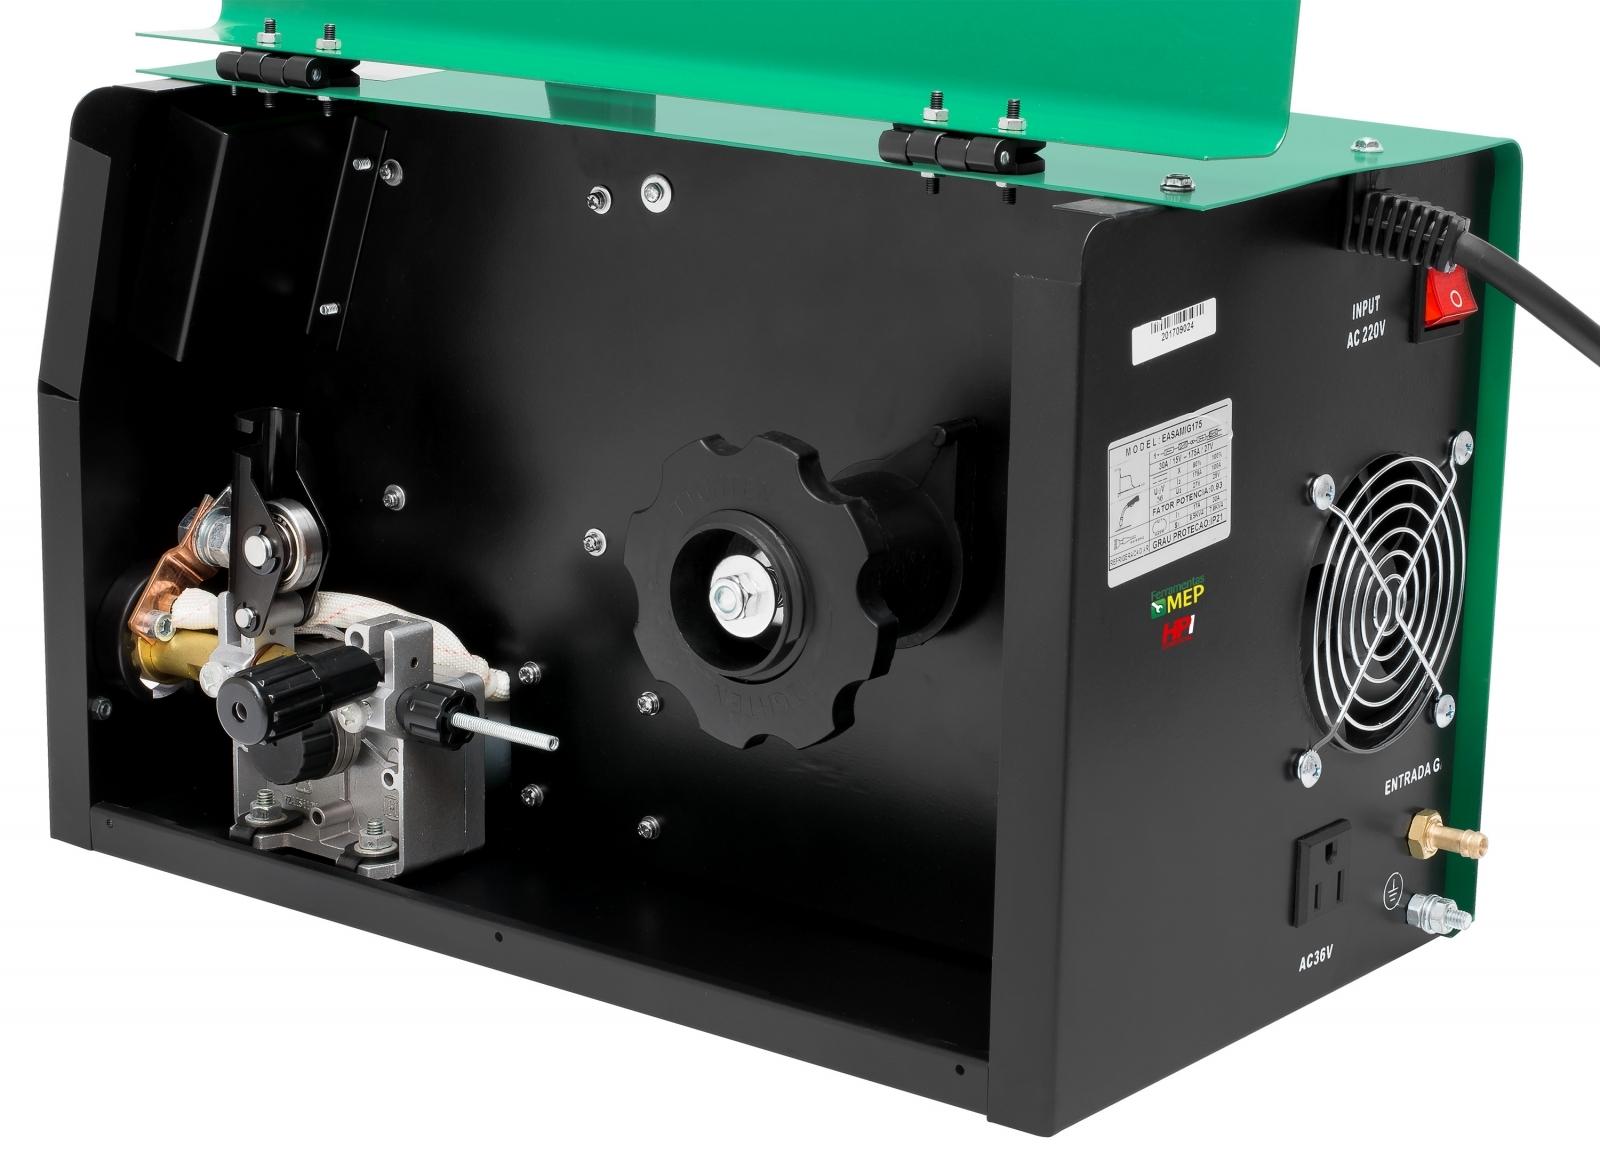 Inversora De Solda Mig Mag Brax 175 Multiprocesso 220v - Ferramentas MEP